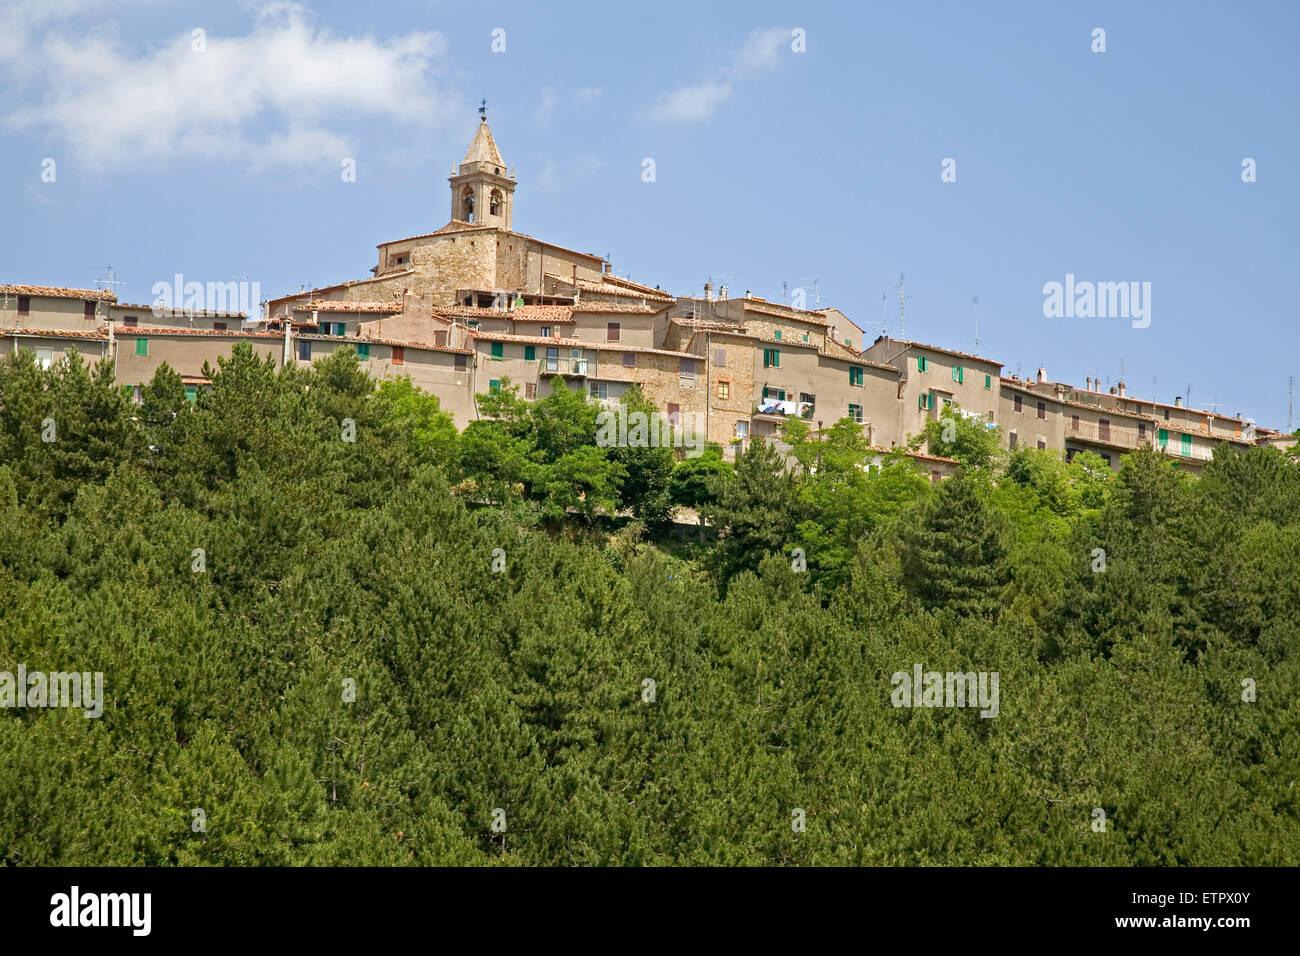 Europa, Italien, Toskana, Monticello Amiata Dorf Stockfoto